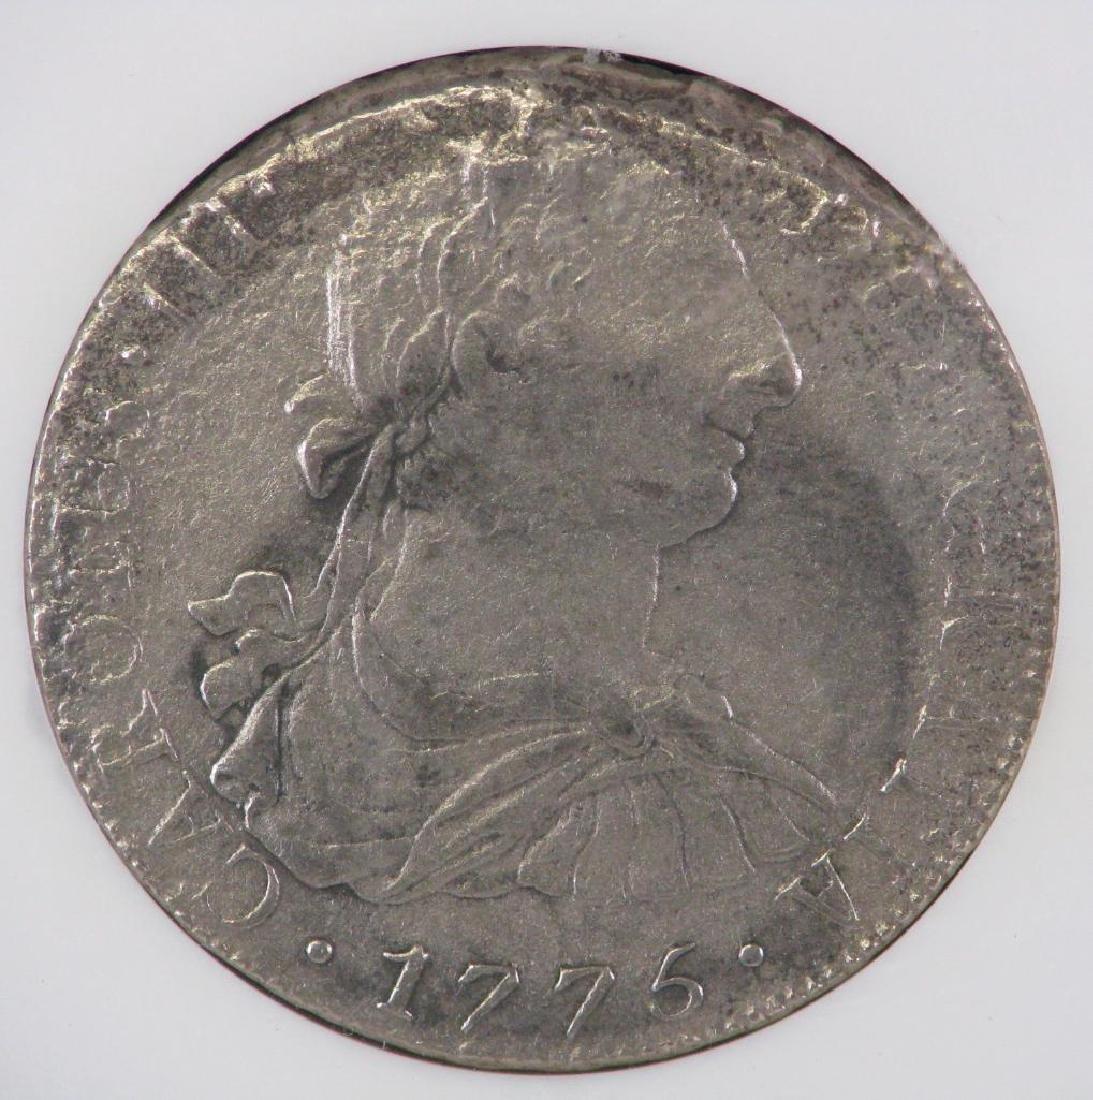 Mexico 1775-Mo FM 8 Reales - 3